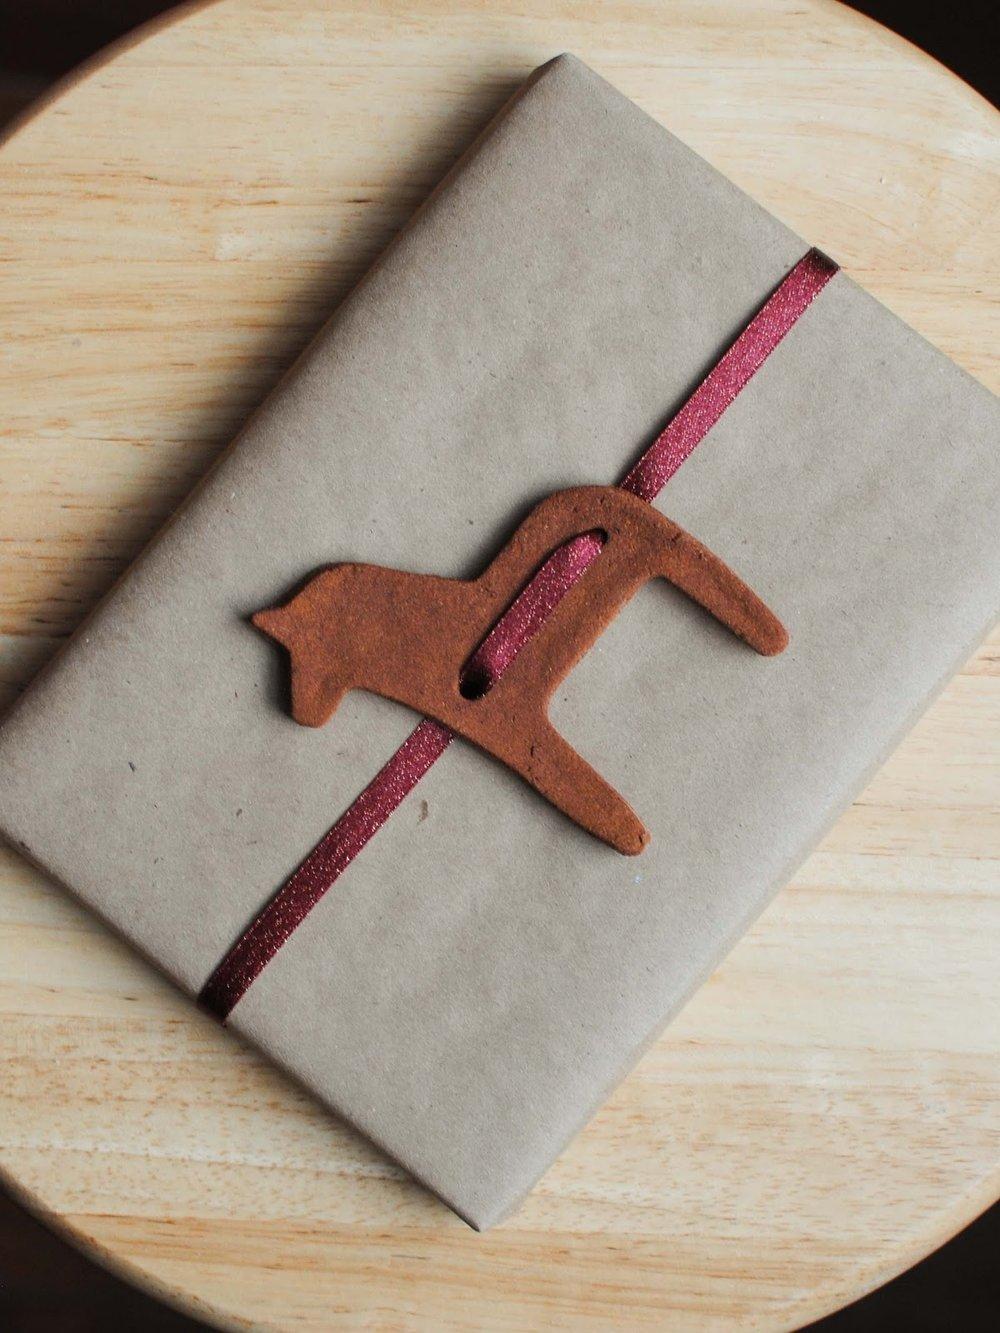 Source:  Cinnamon Dough Gift Tags  (not edible!)